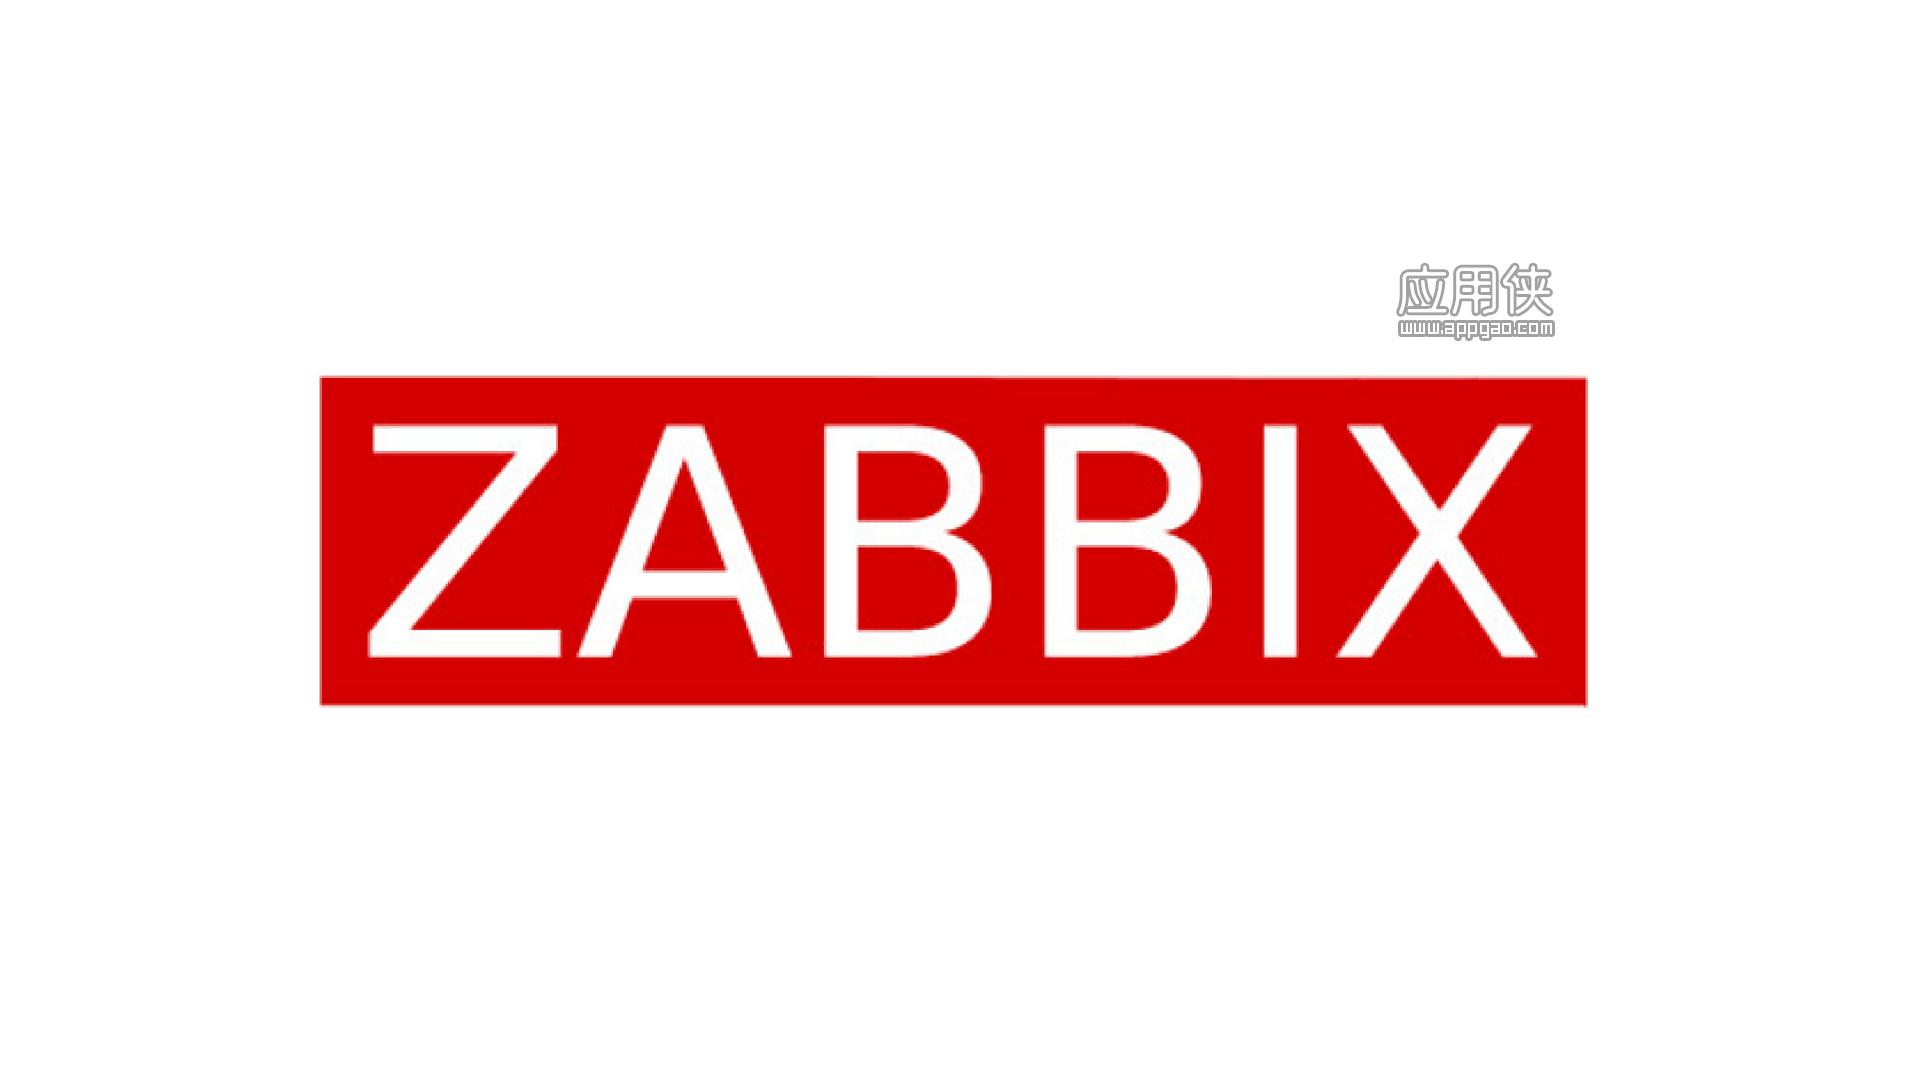 zabbix 的 Windows 客户端